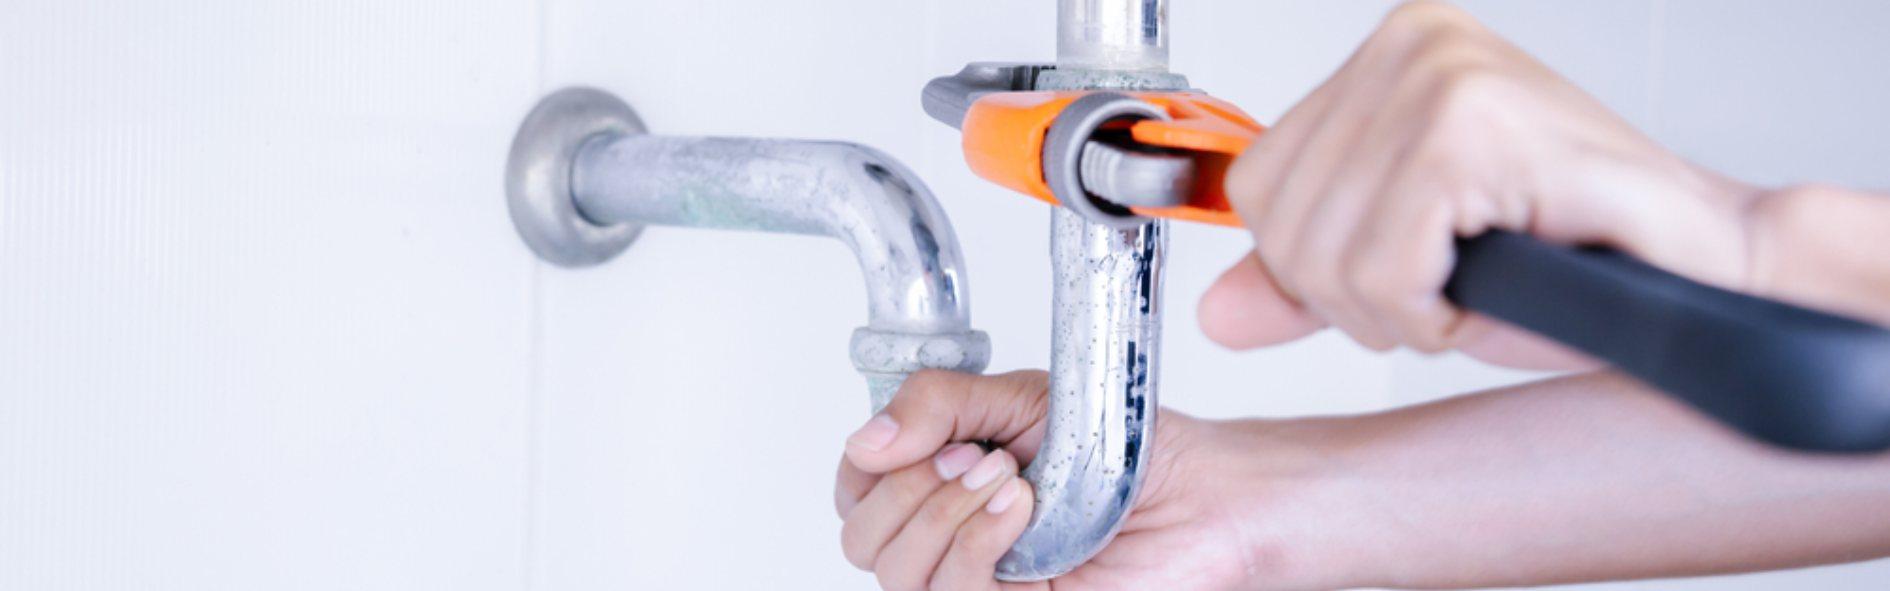 Descubre las averías de fontanería doméstica más comunes